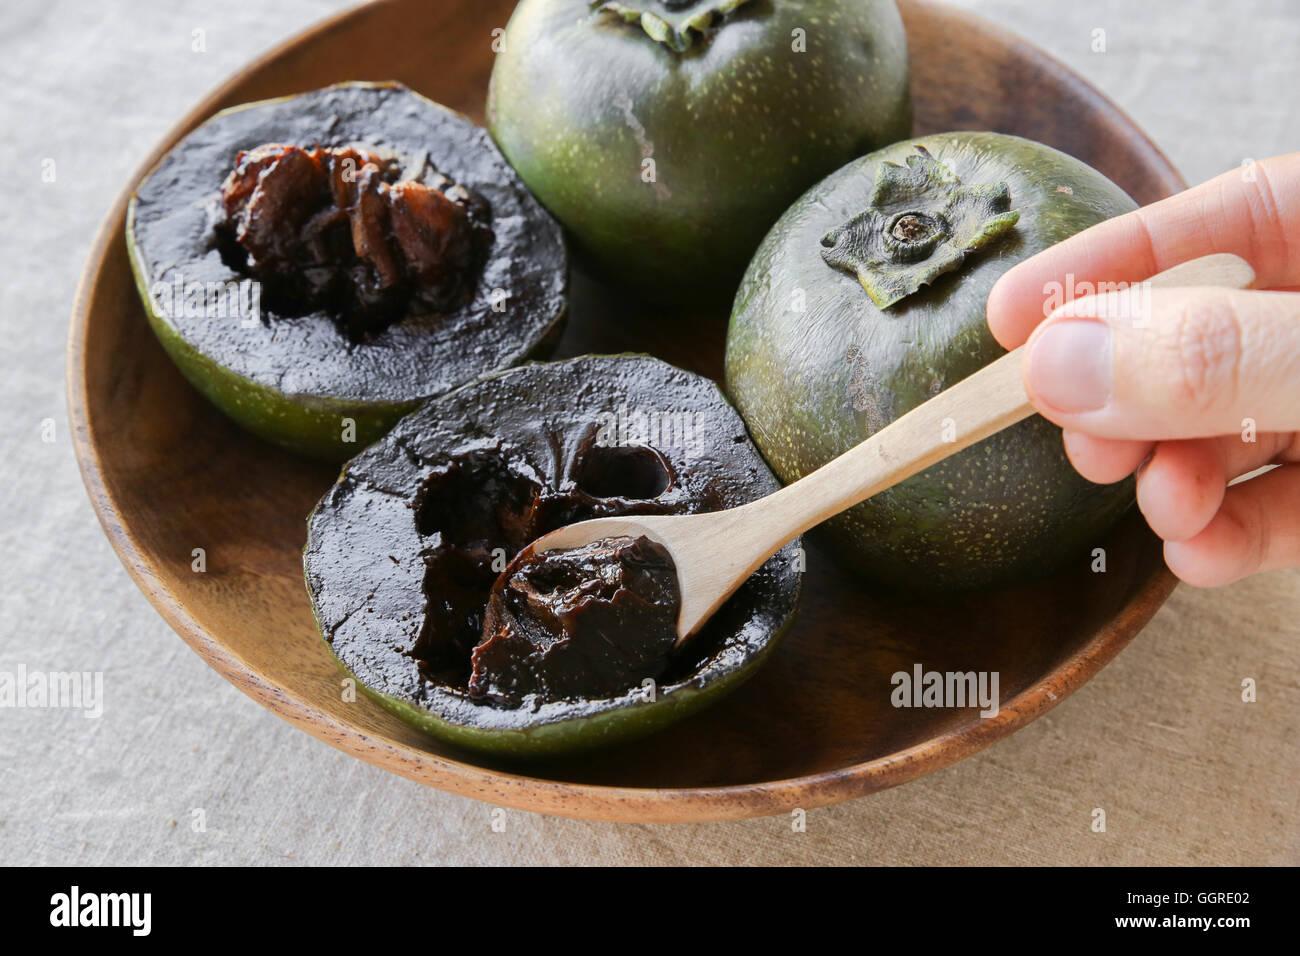 Black Persimmon 6 seeds Chocolate Pudding Fruit BLACK SAPOTE